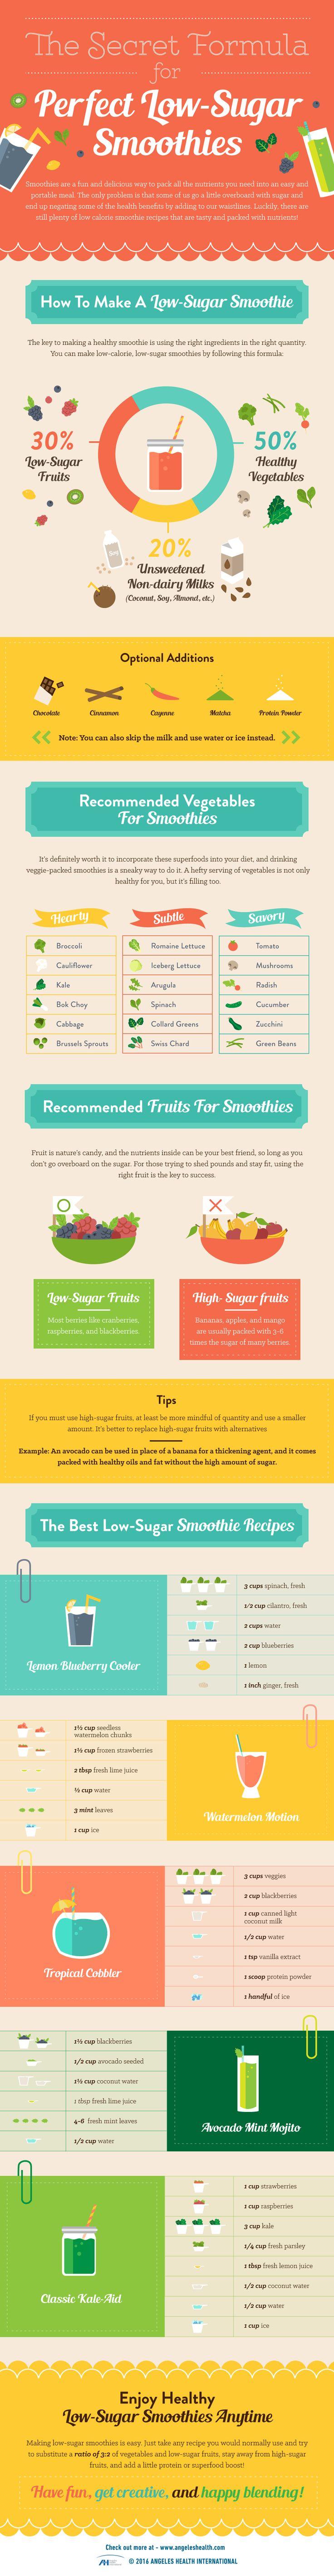 the-secret-formula-for-low-sugar-smoothies